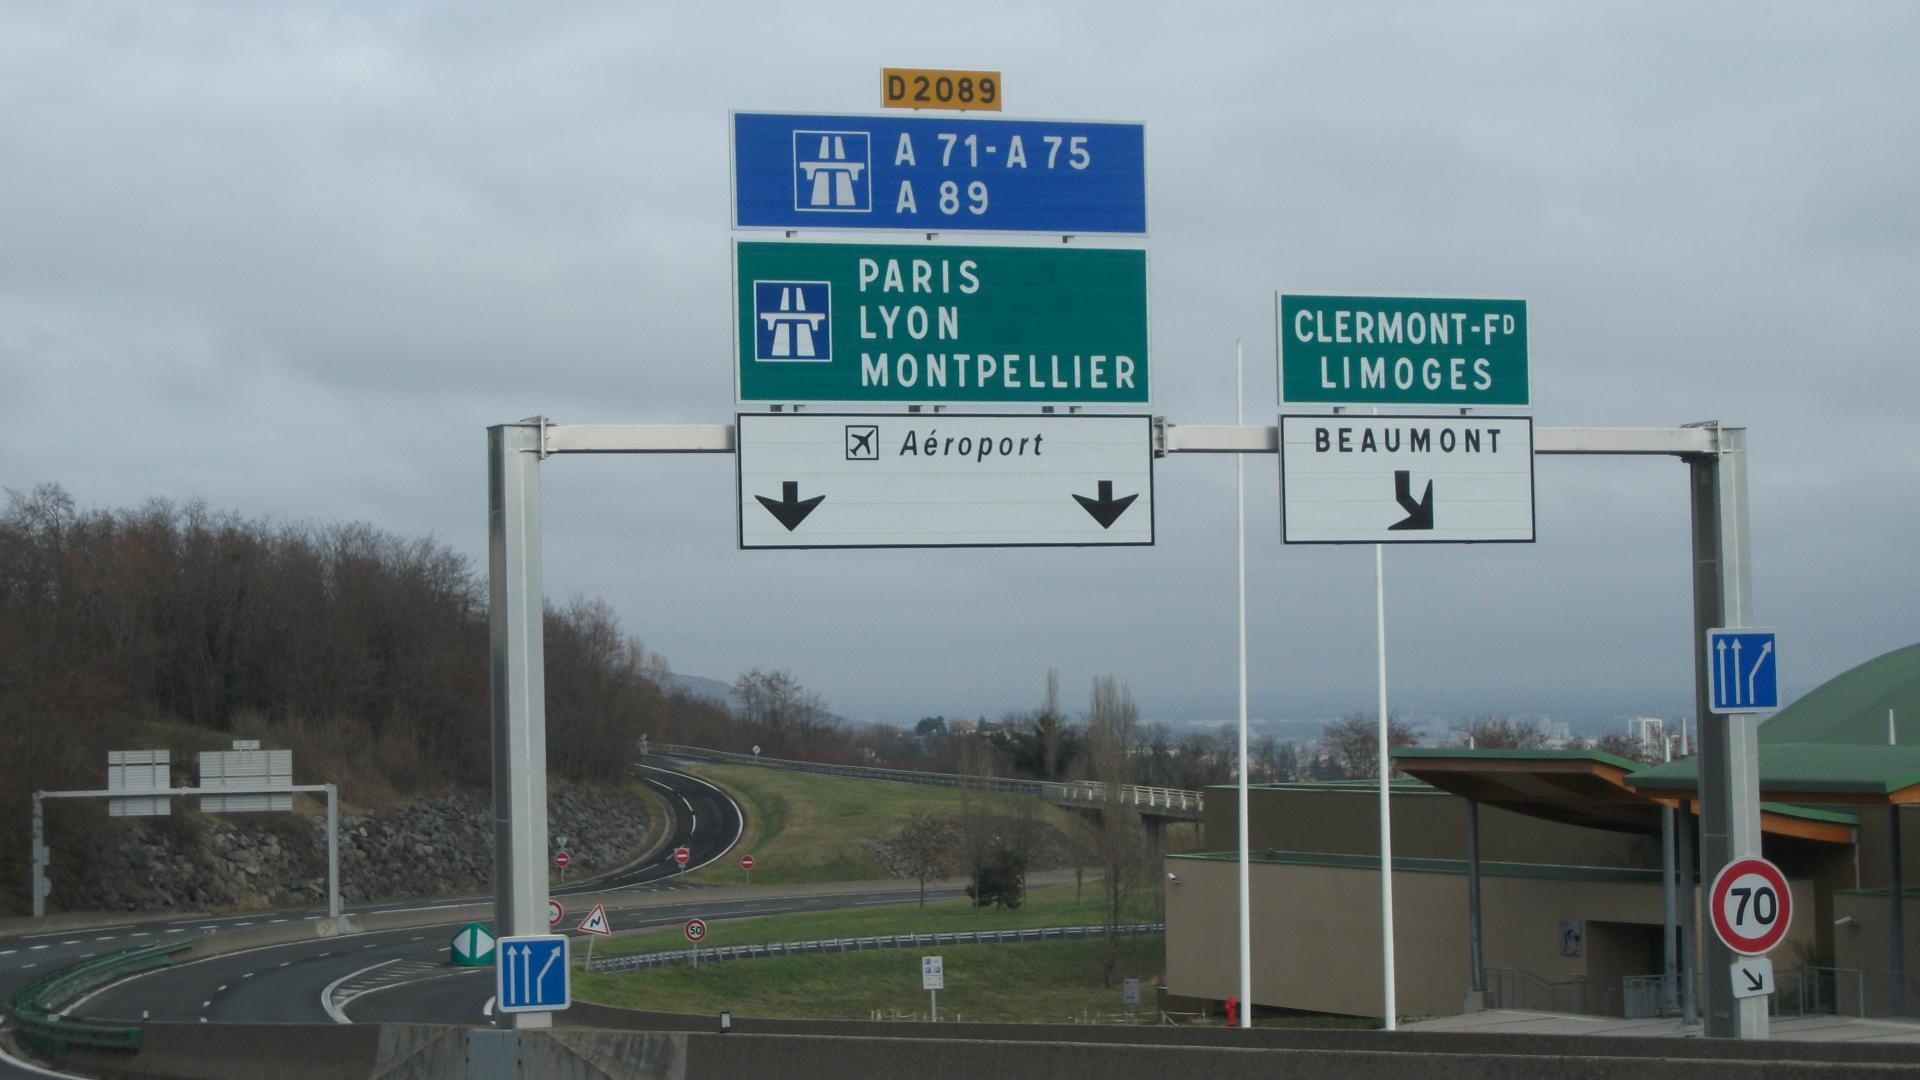 File:Ceyrat - D 2089 Voie Express vers autoroutes.JPG